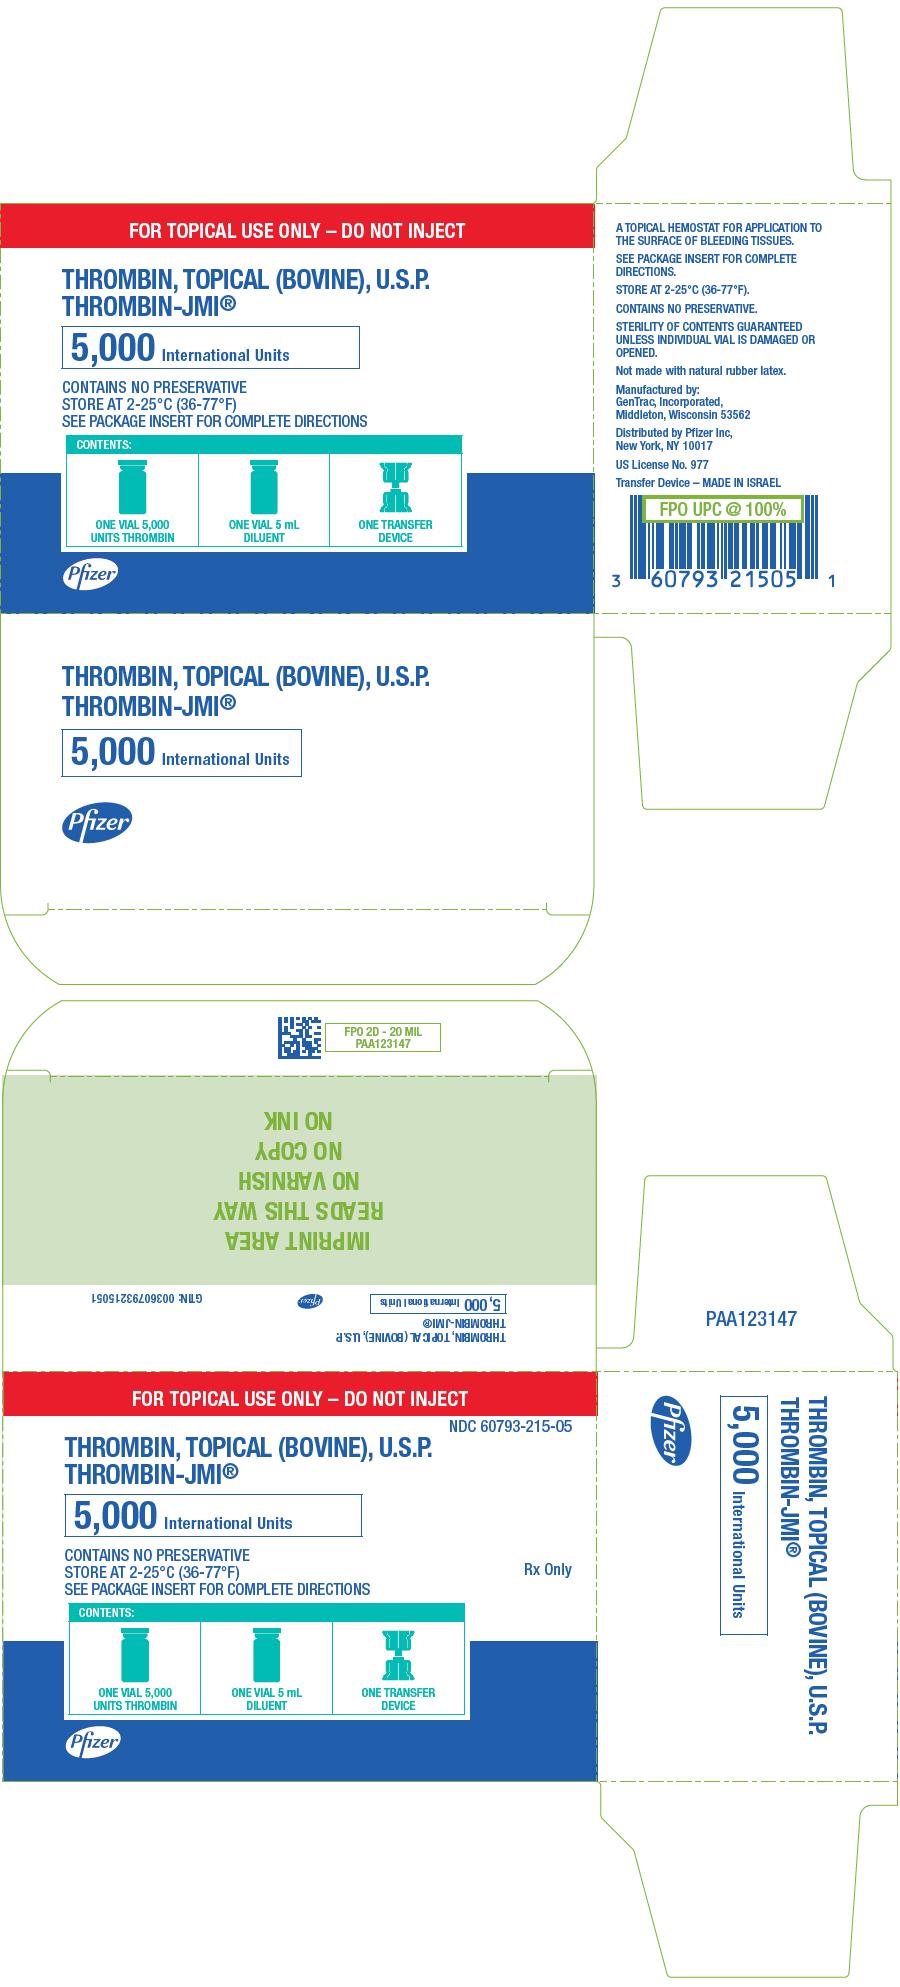 NDC Code 60793-705-05 | pharmacompass com